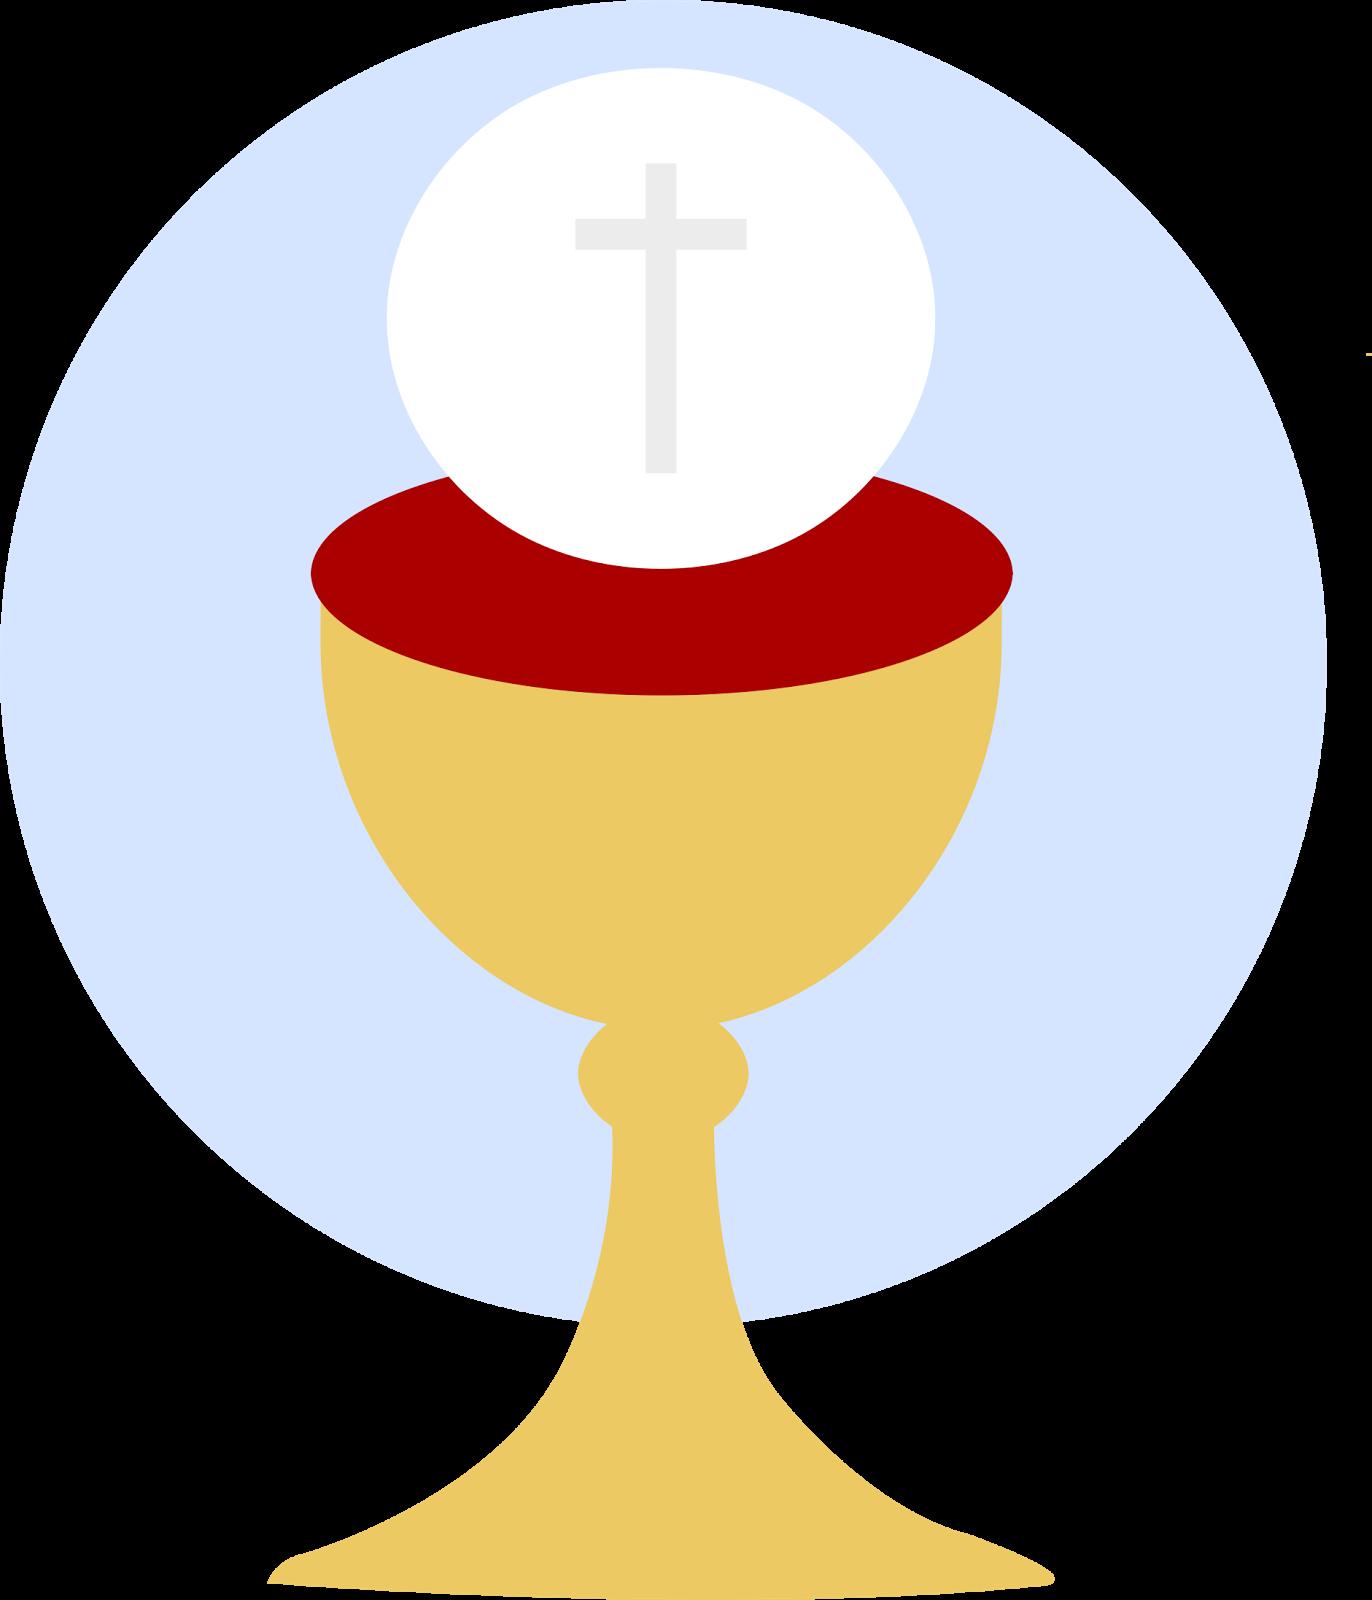 clip art free library Bibliography religious studies bibliographies. Chalice clipart sacrament eucharist.